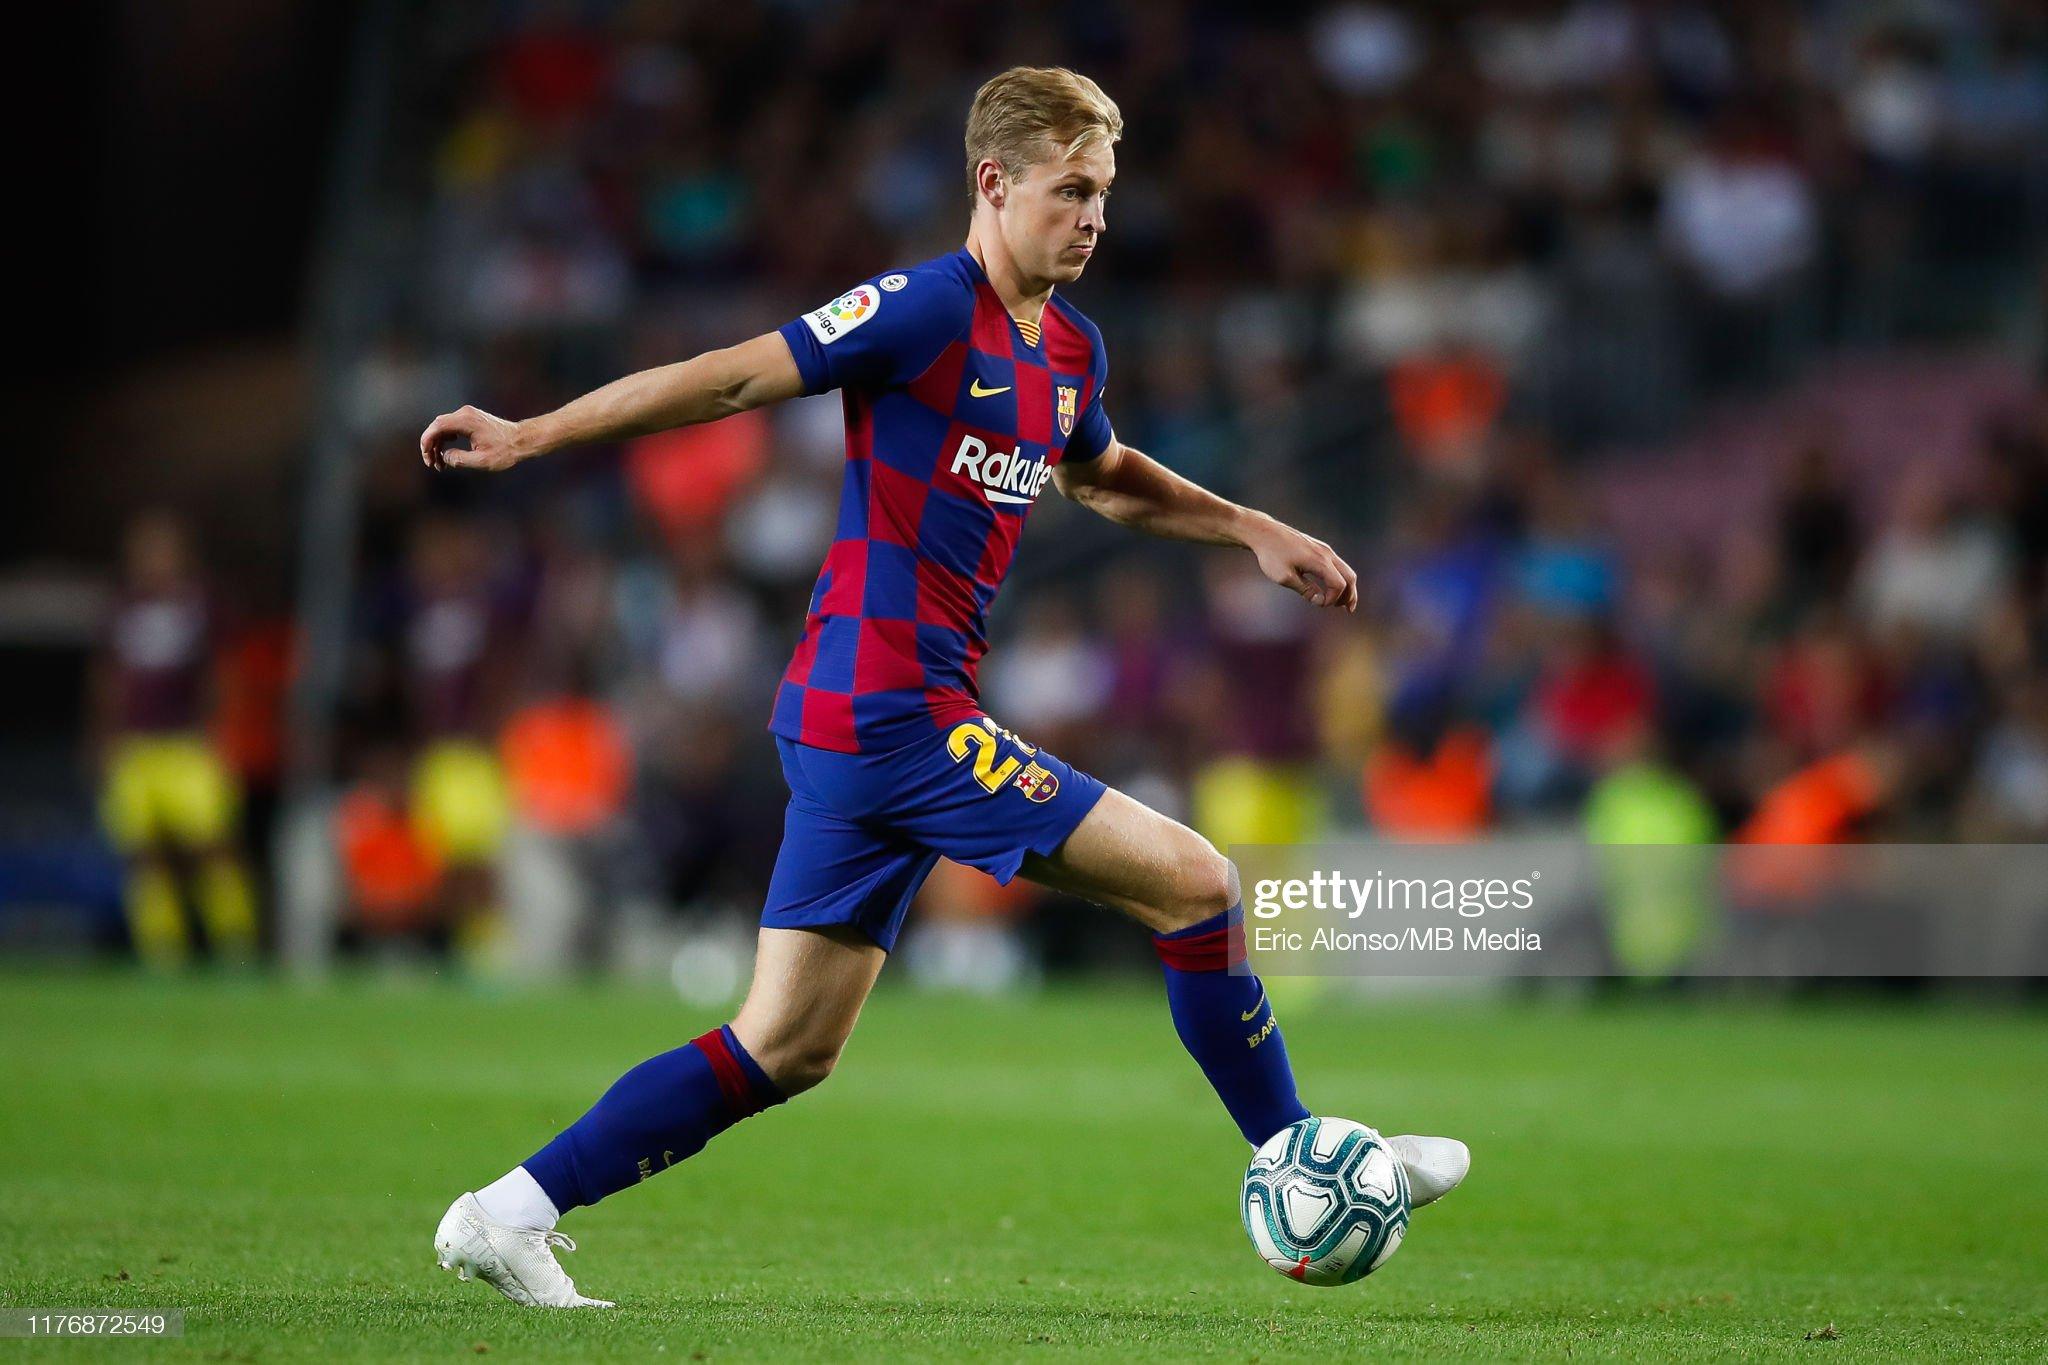 صور مباراة : برشلونة - فياريال 2-1 ( 24-09-2019 )  Frenkie-de-jong-of-fc-barcelona-passes-the-ball-during-the-liga-match-picture-id1176872549?s=2048x2048